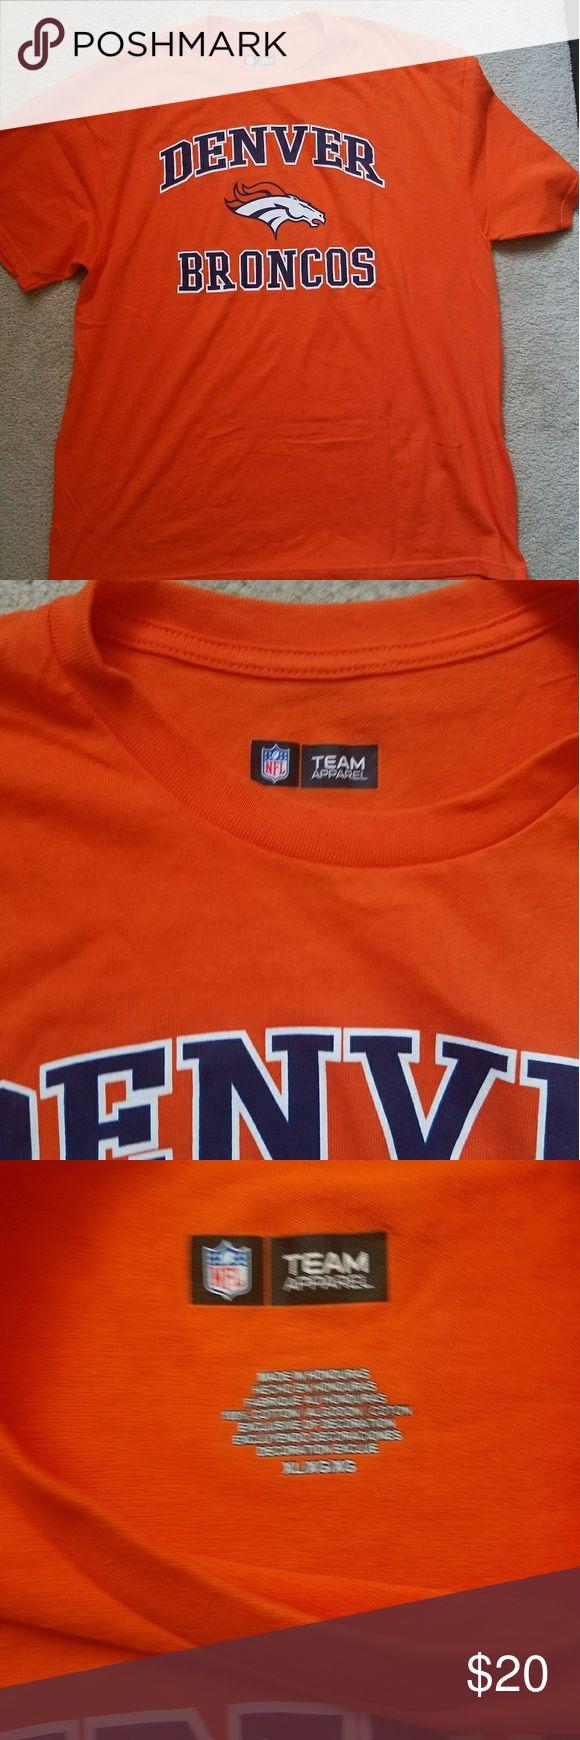 Denver Broncos t shirt Mens Denver Broncos t shirt NWOT new without tags Orange and blue  Size XL NFL Shirts Tees - Short Sleeve